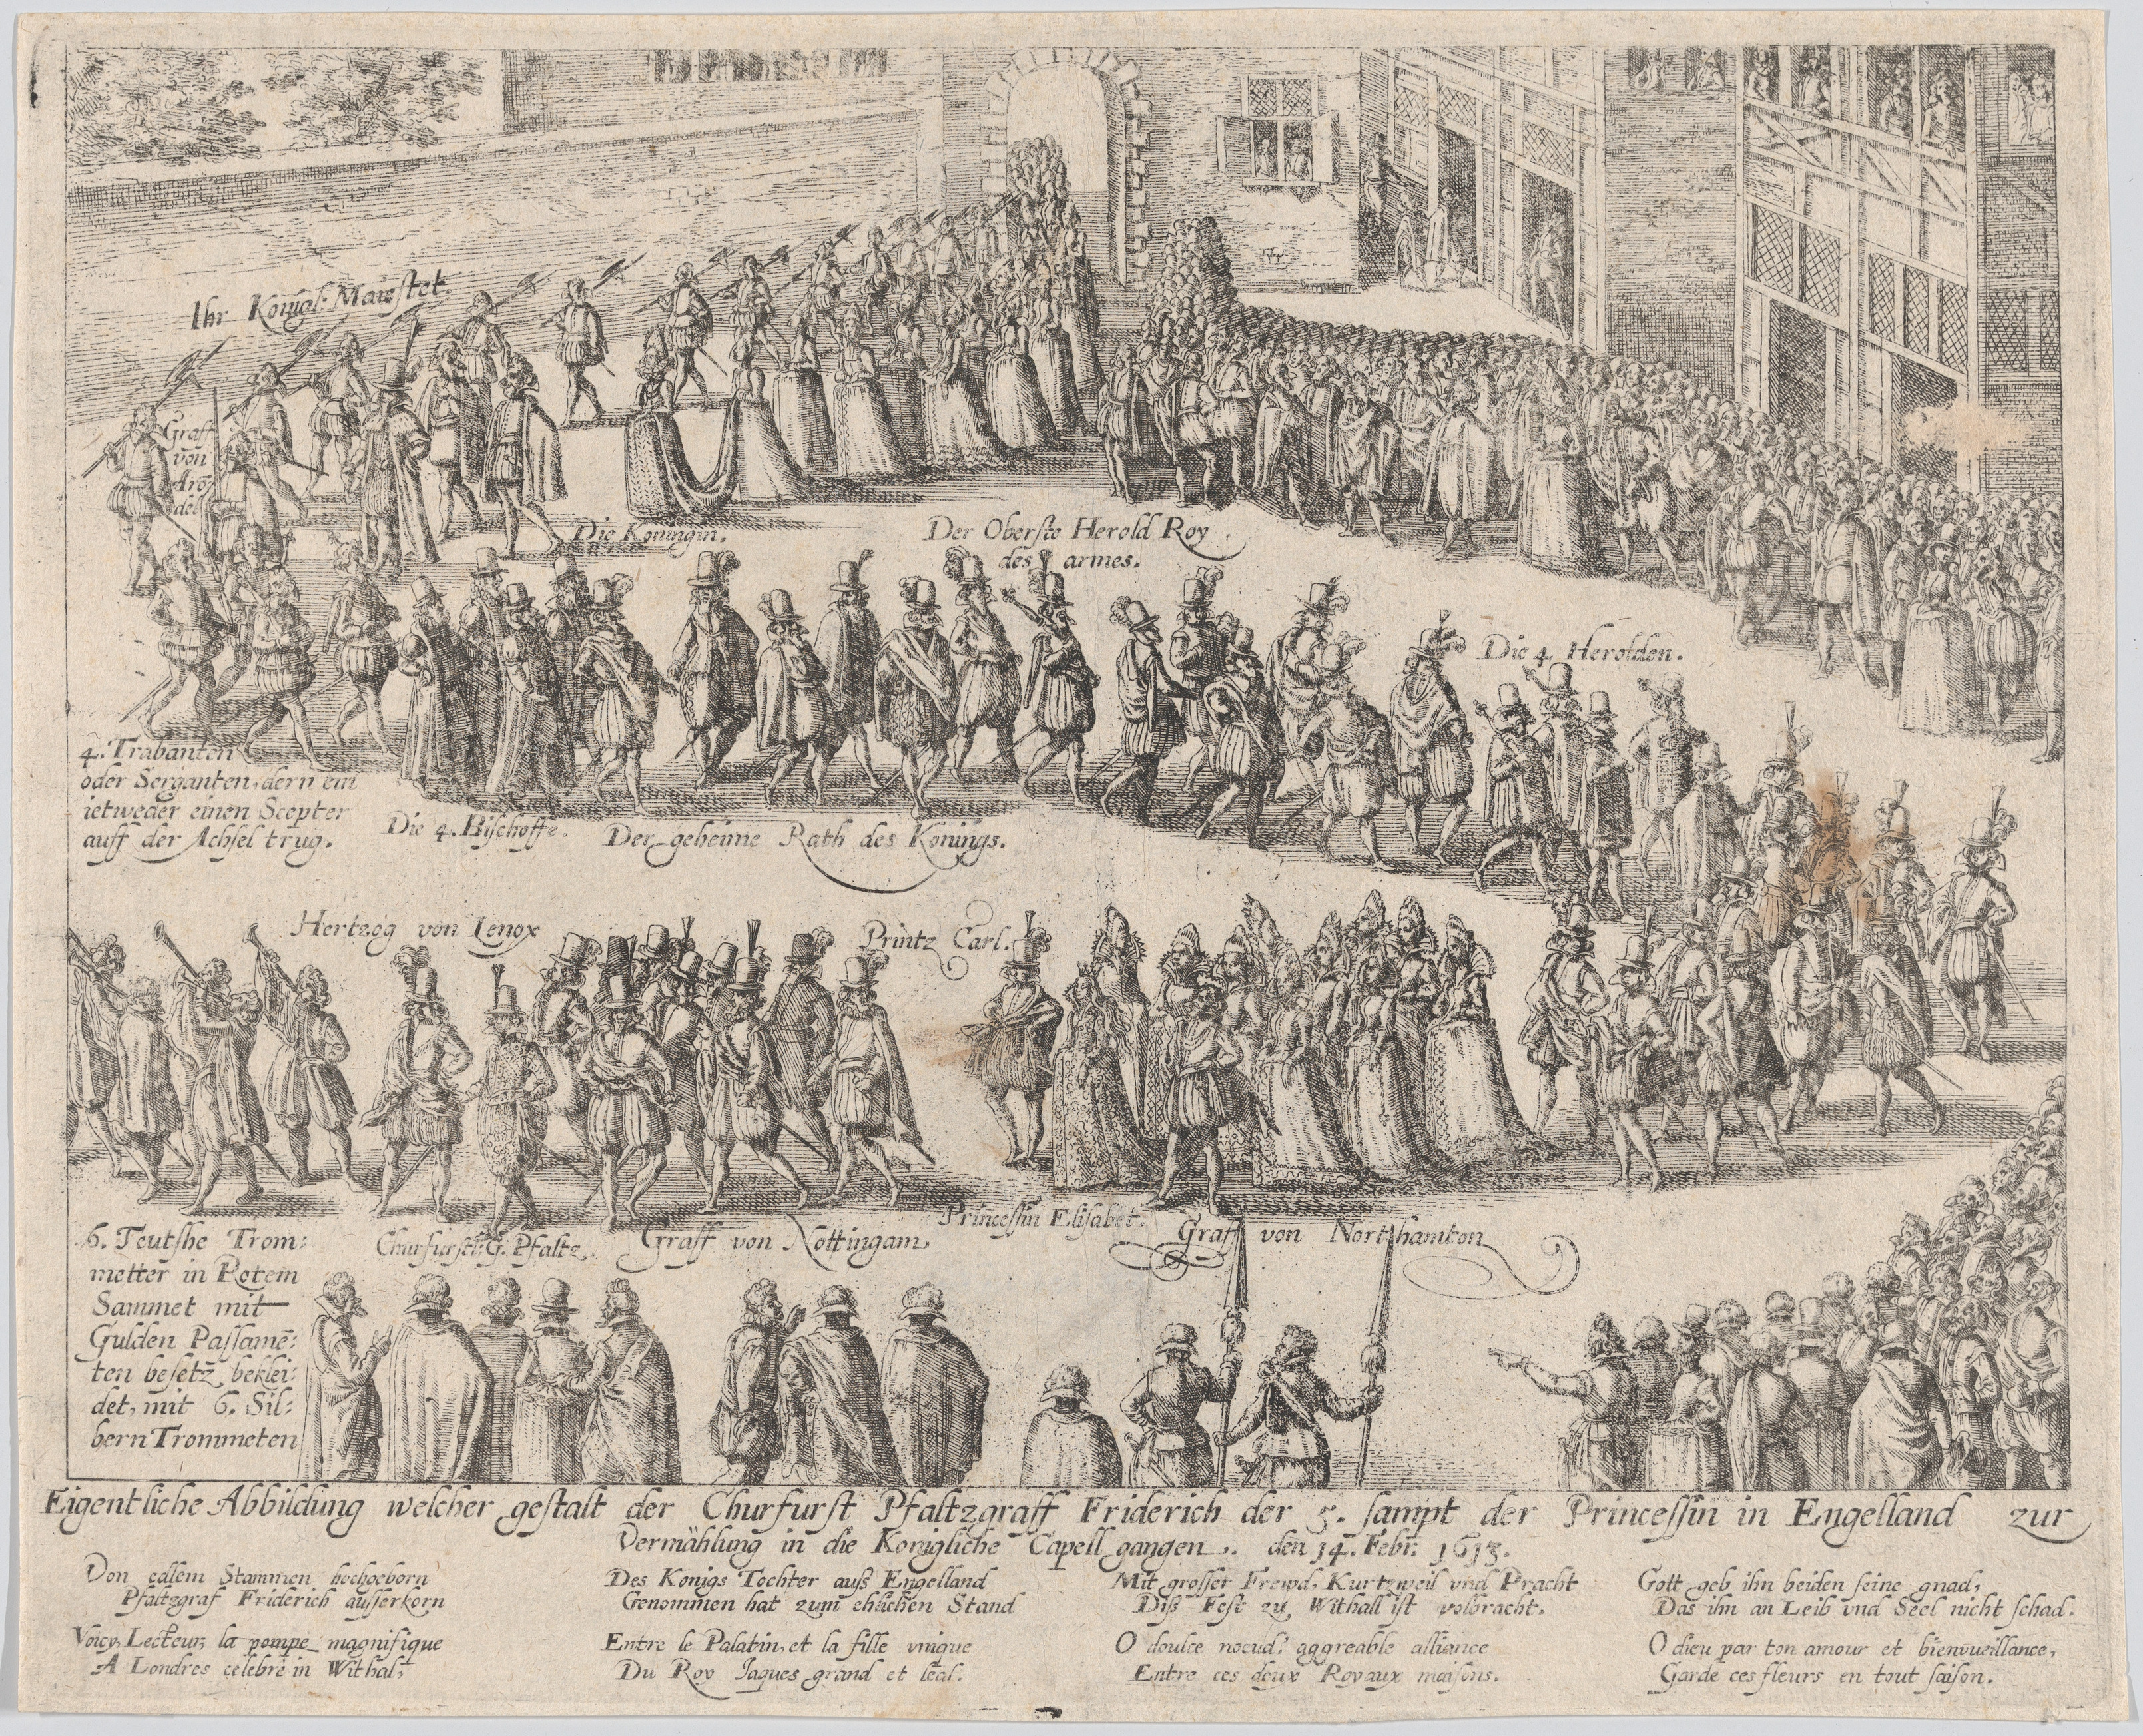 Wedding Procession of Princess Elizabeth and Count Palatine